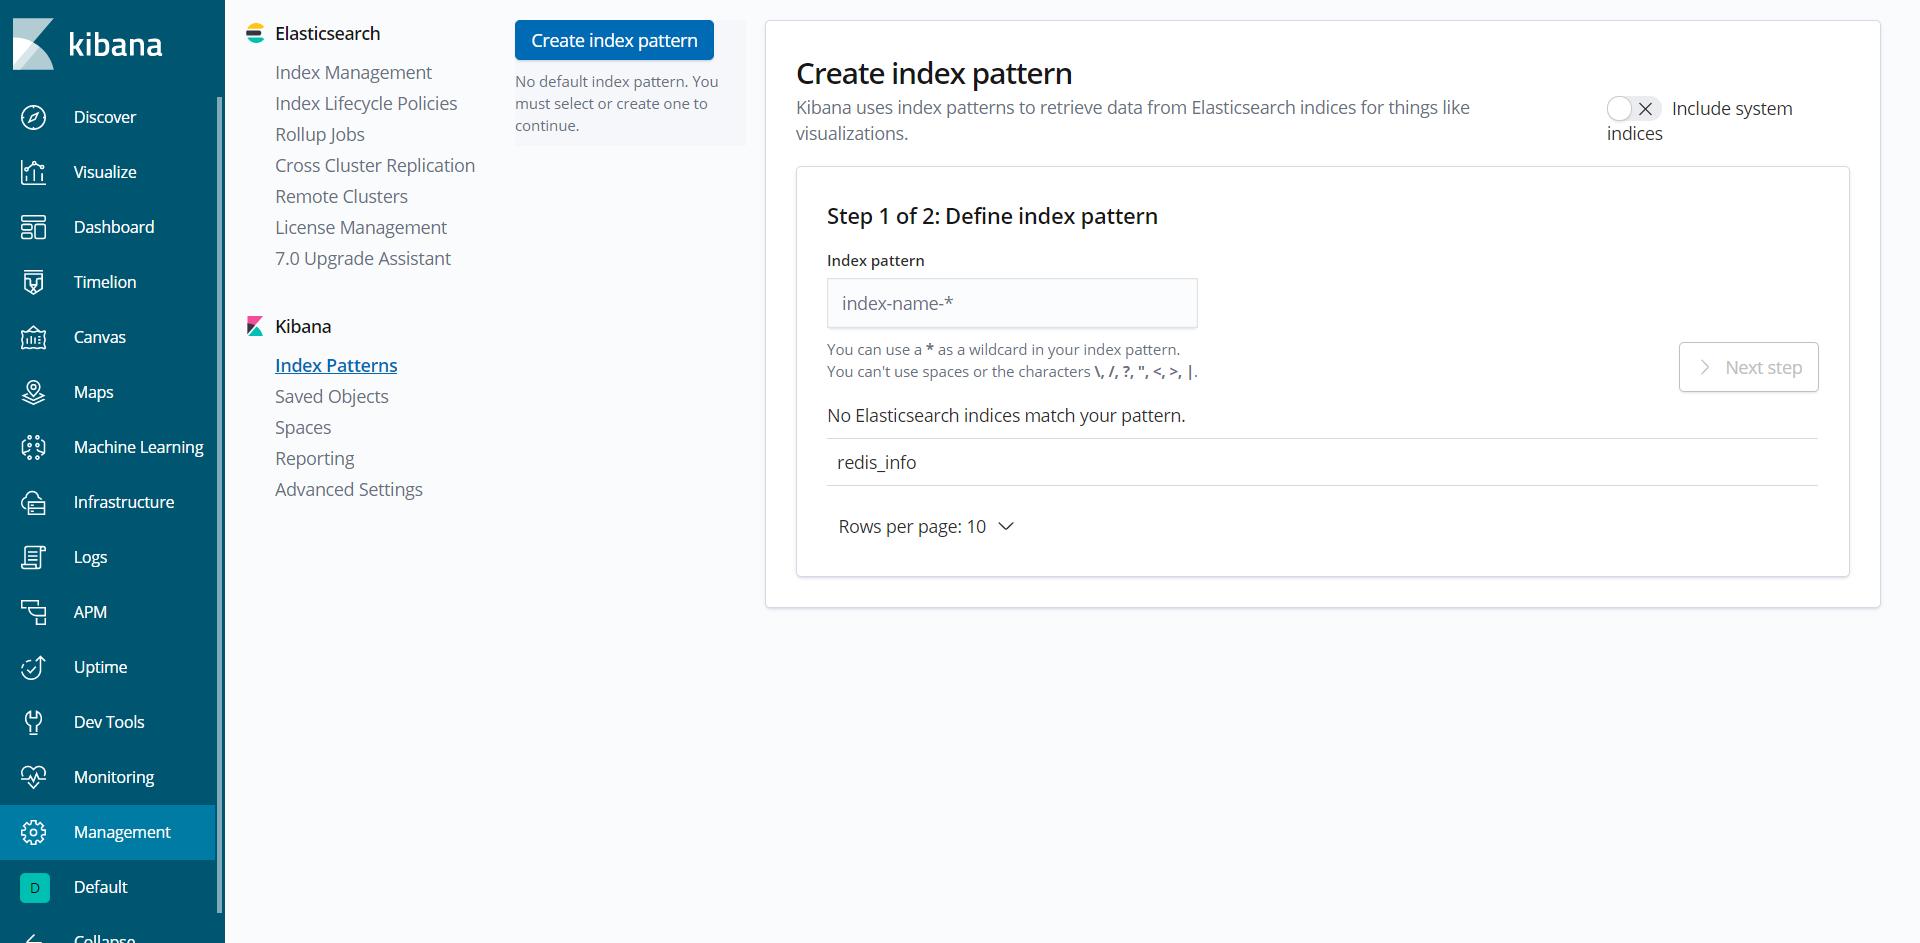 Kibana - Index Pattern Creation